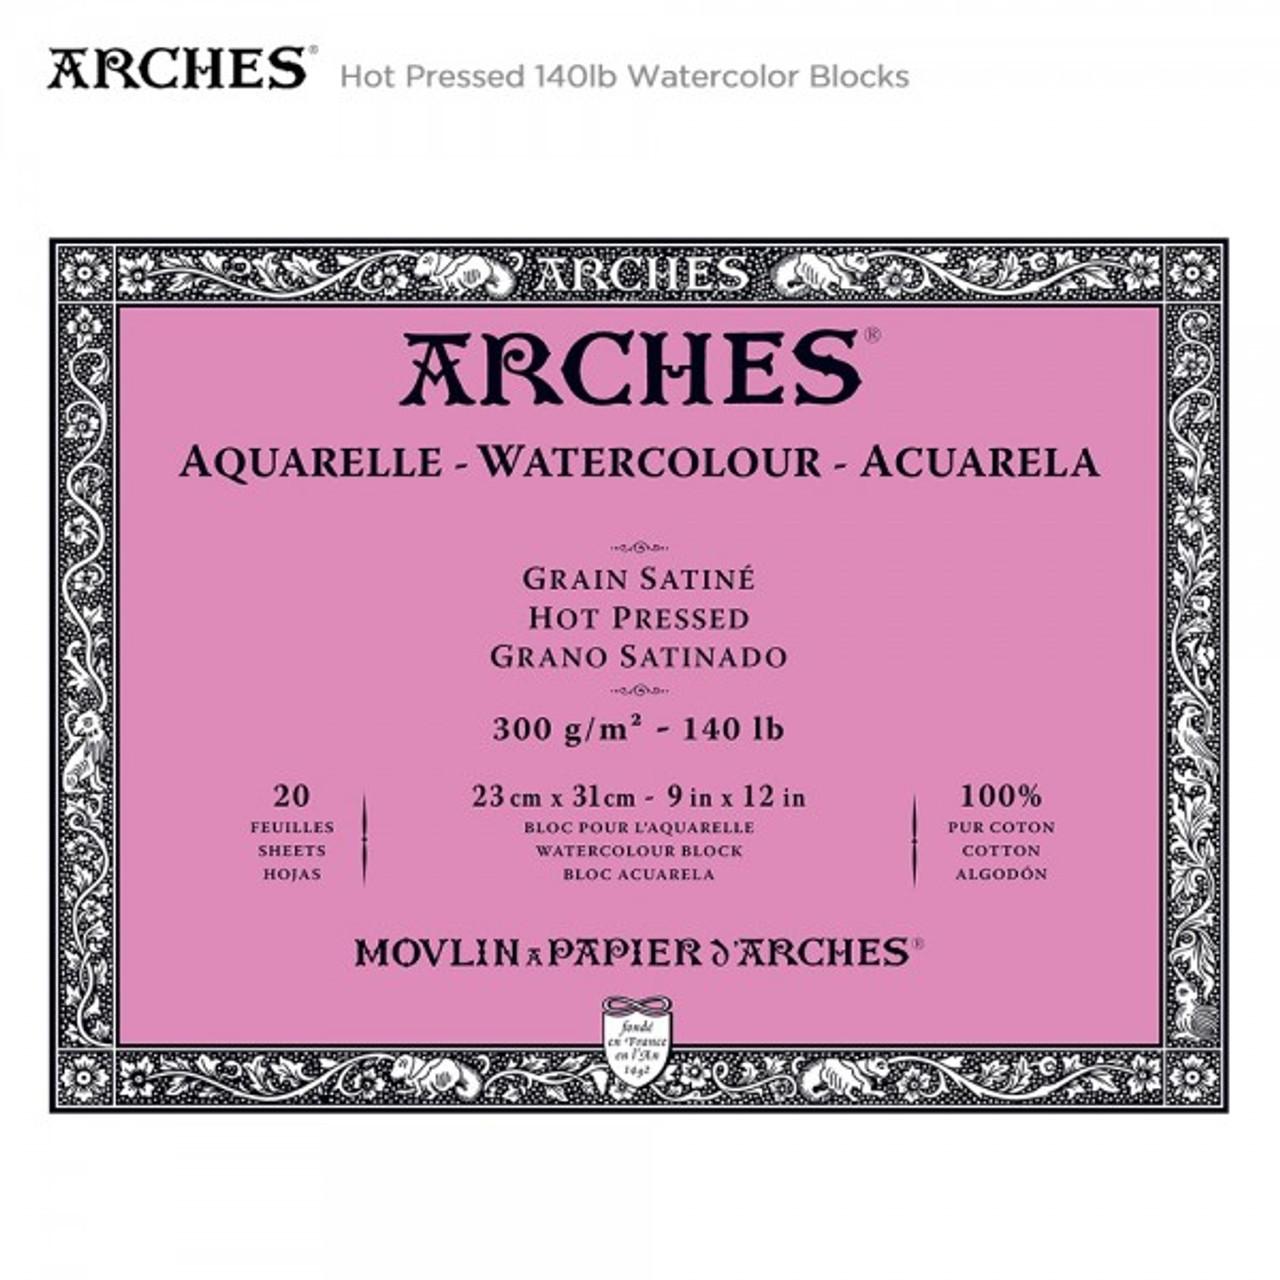 Arches 140 lb. Watercolor Block, Hot-Pressed